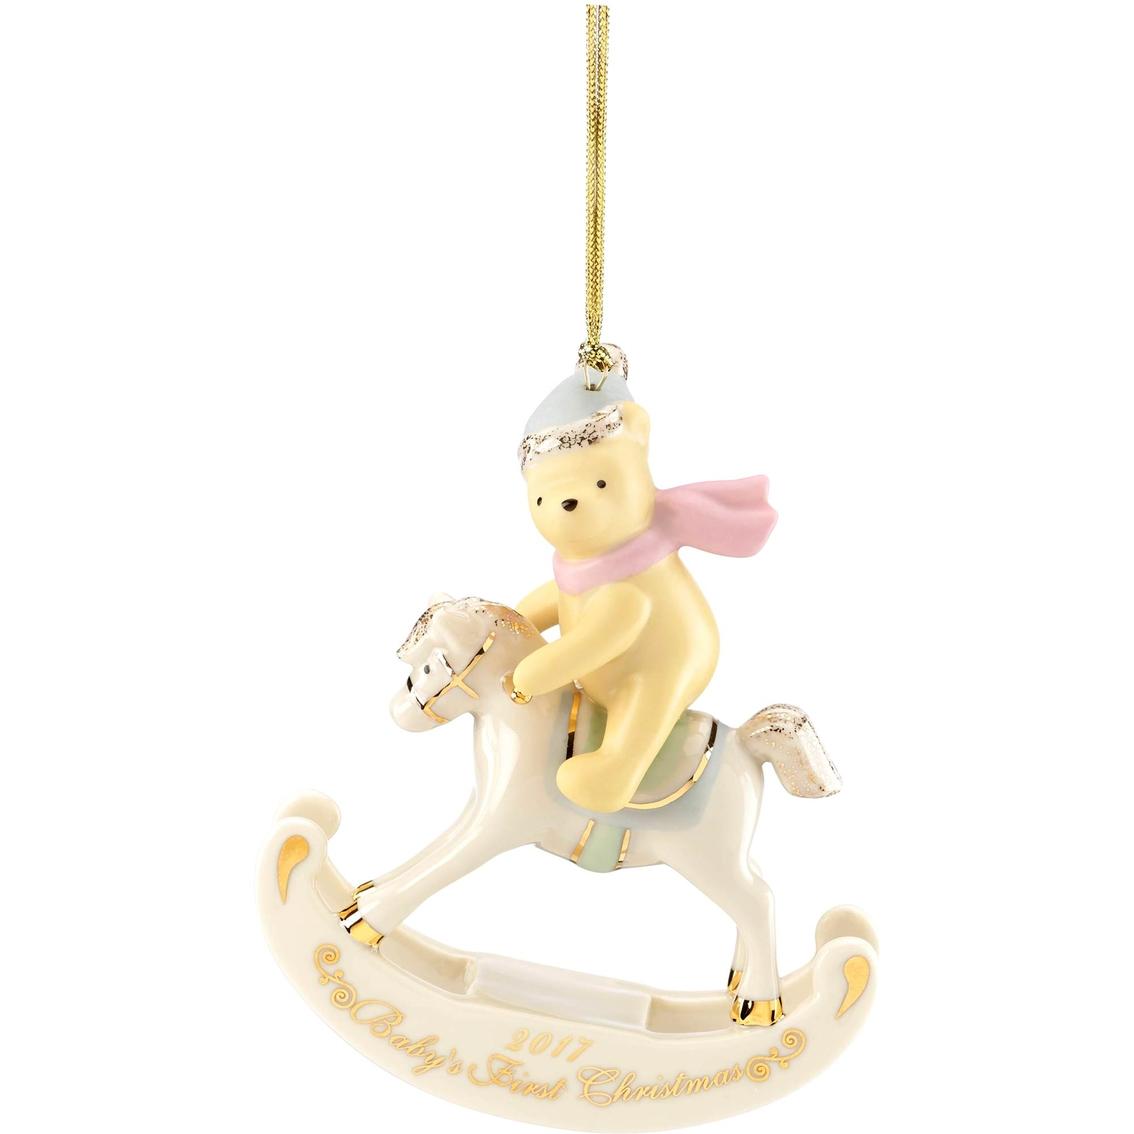 lenox 2017 disneys winnie the pooh babys first christmas ornament